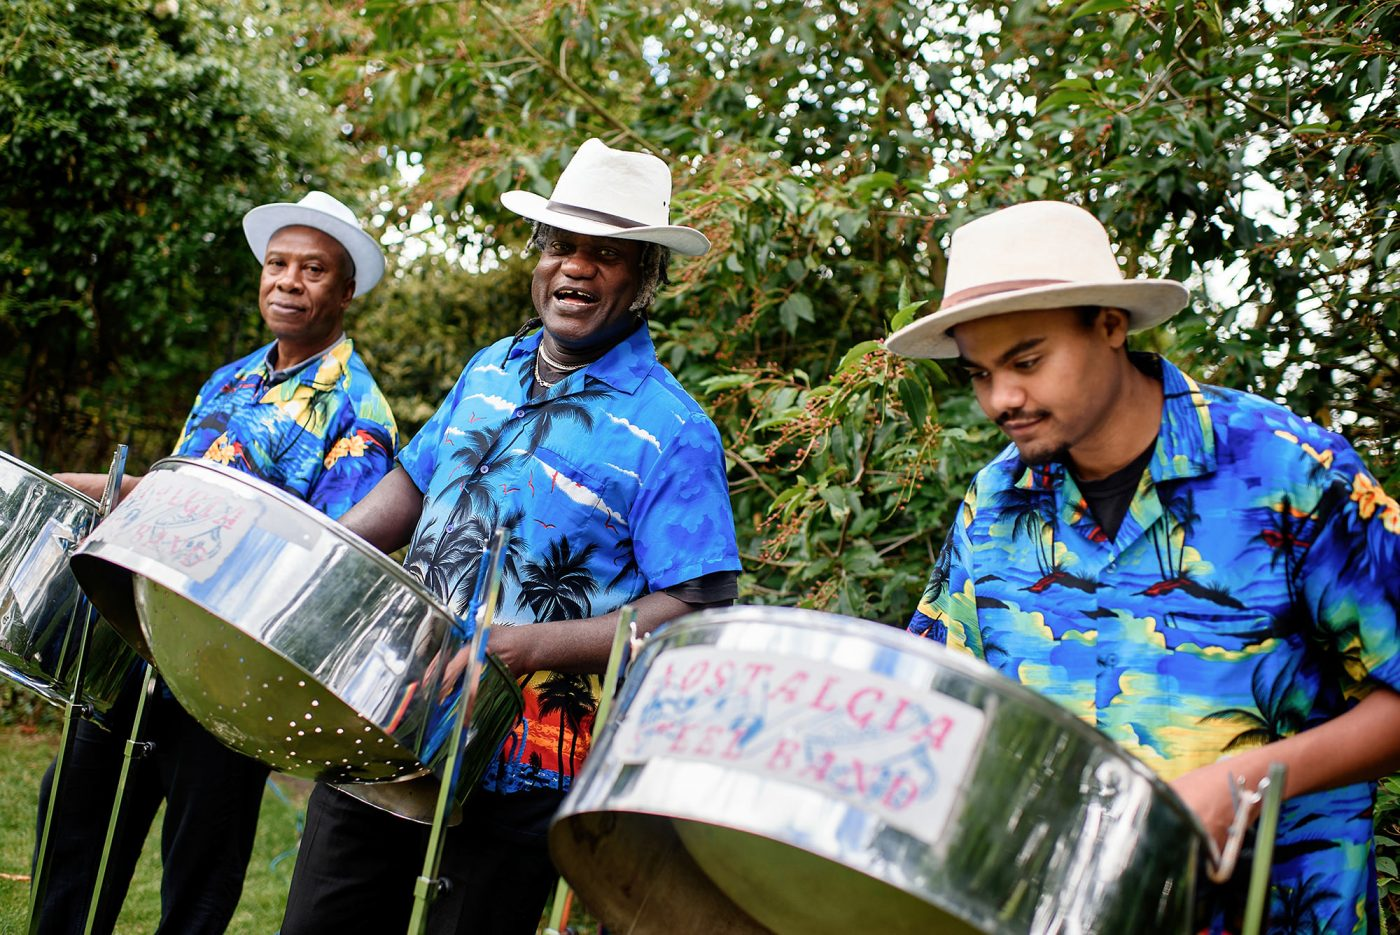 steel drum band at wedding